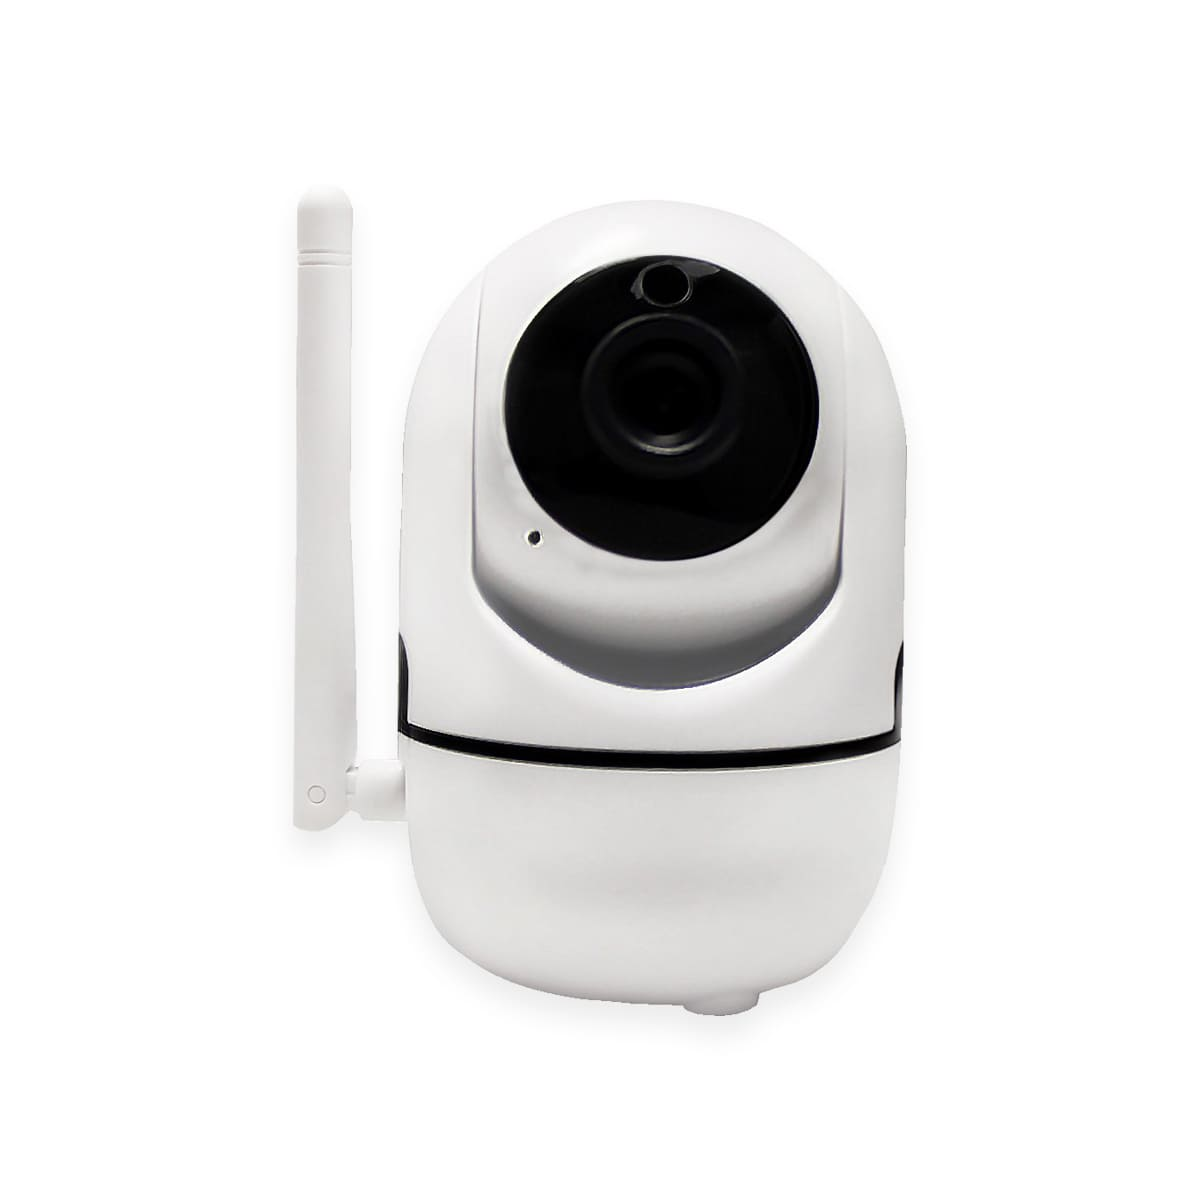 Câmera Wi-Fi Inteligente HB TECH IP Robô Rastreadora